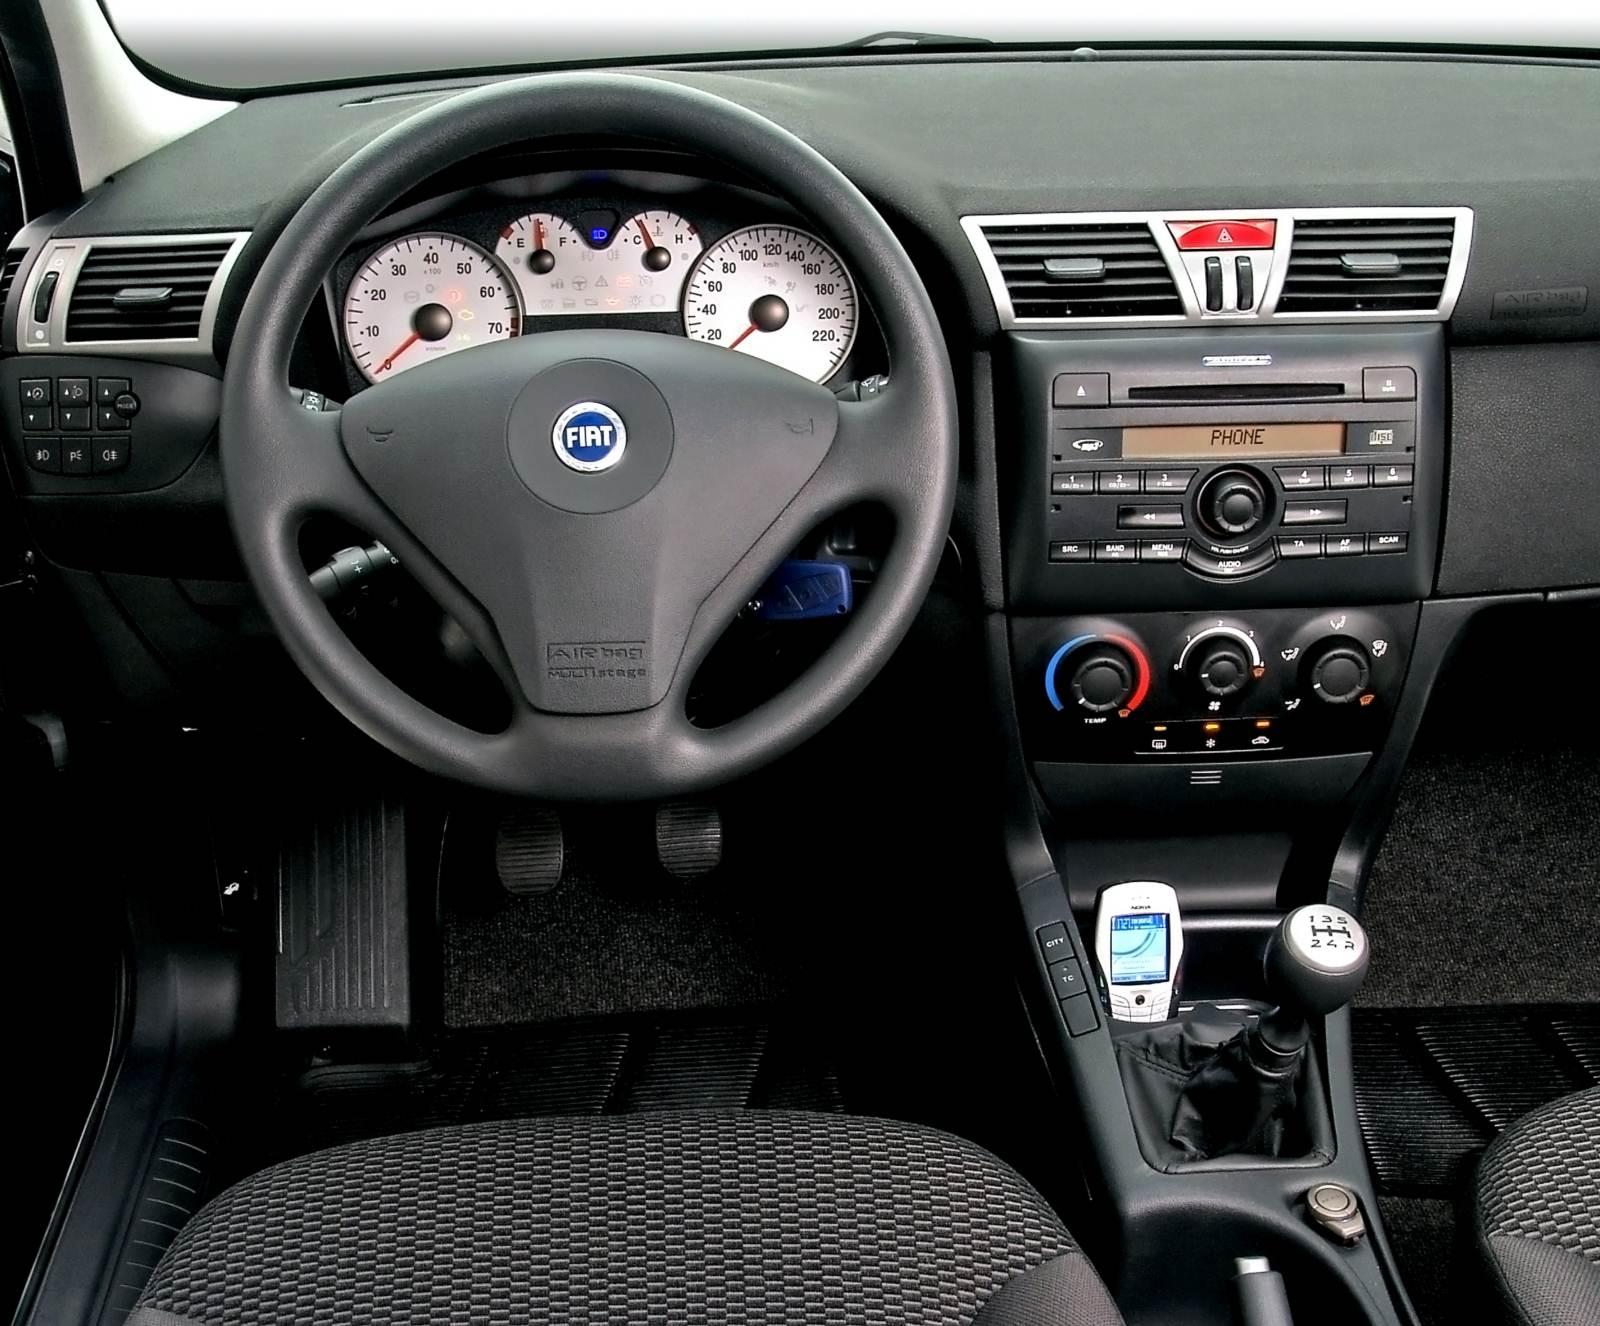 fiat j produziu 13 milh es de carros no brasil car blog br